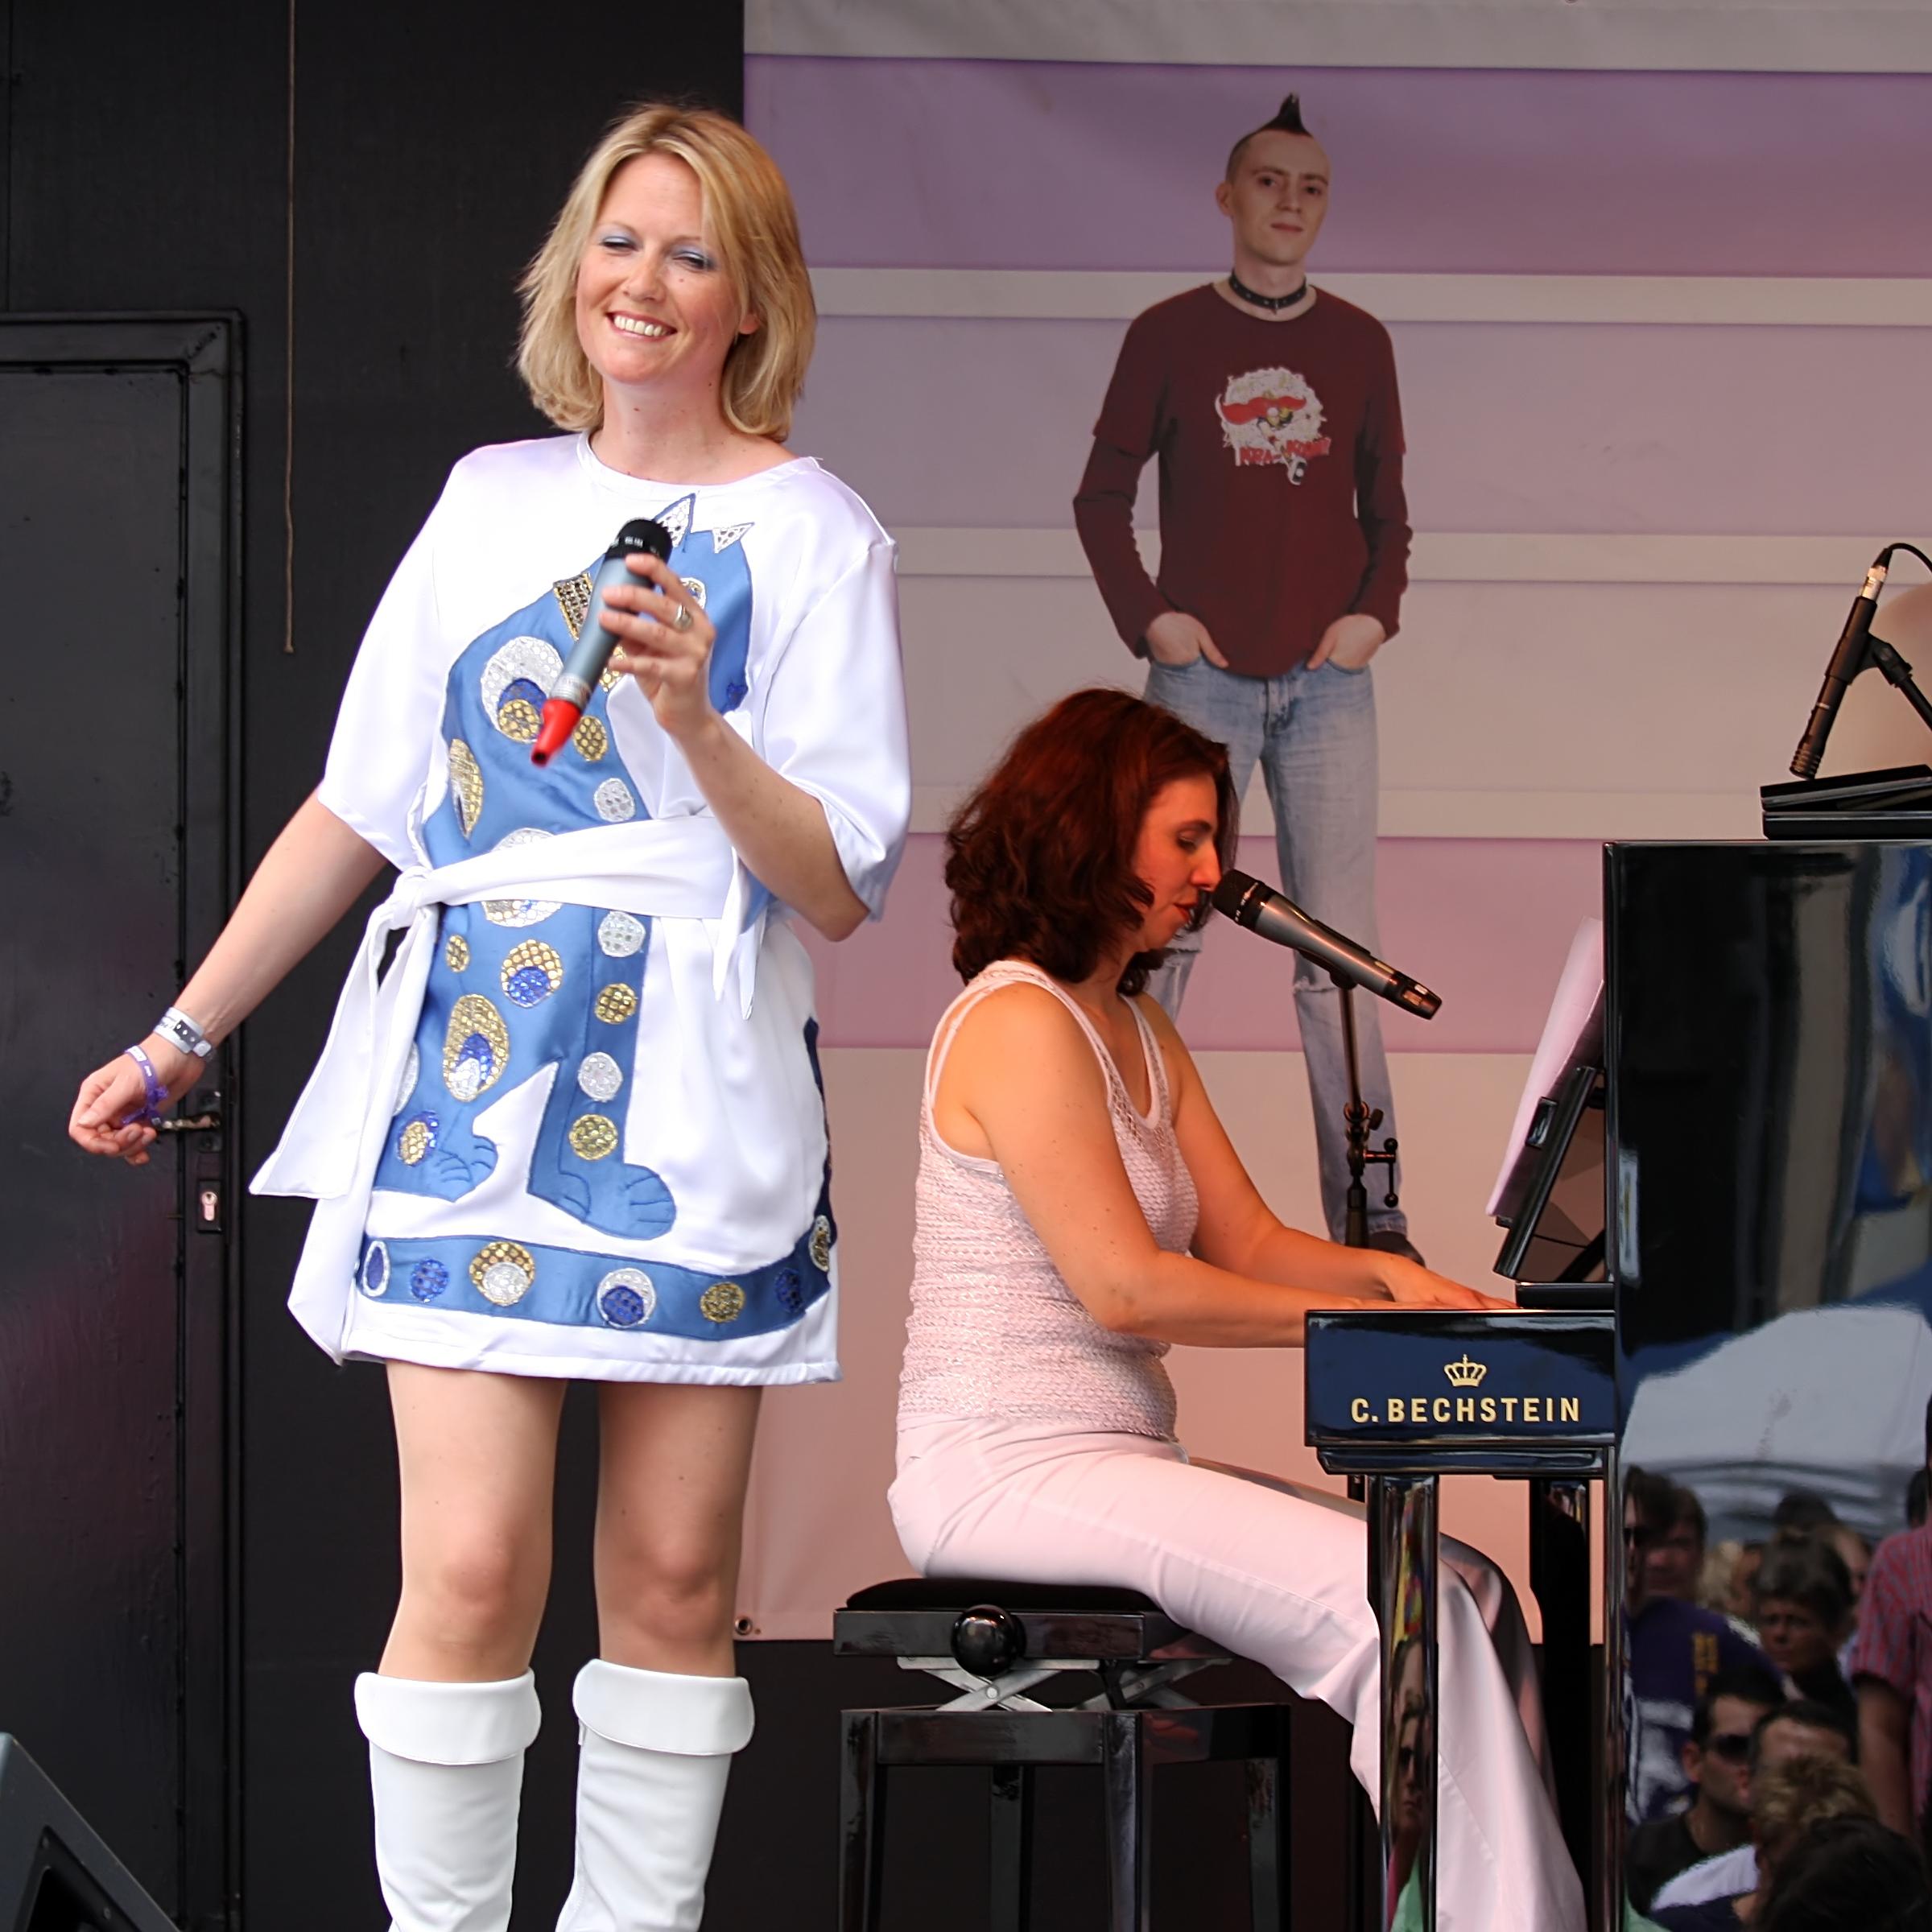 File:Meike Gottschalk als Agnetha - ColognePride 2009 (2398).jpg